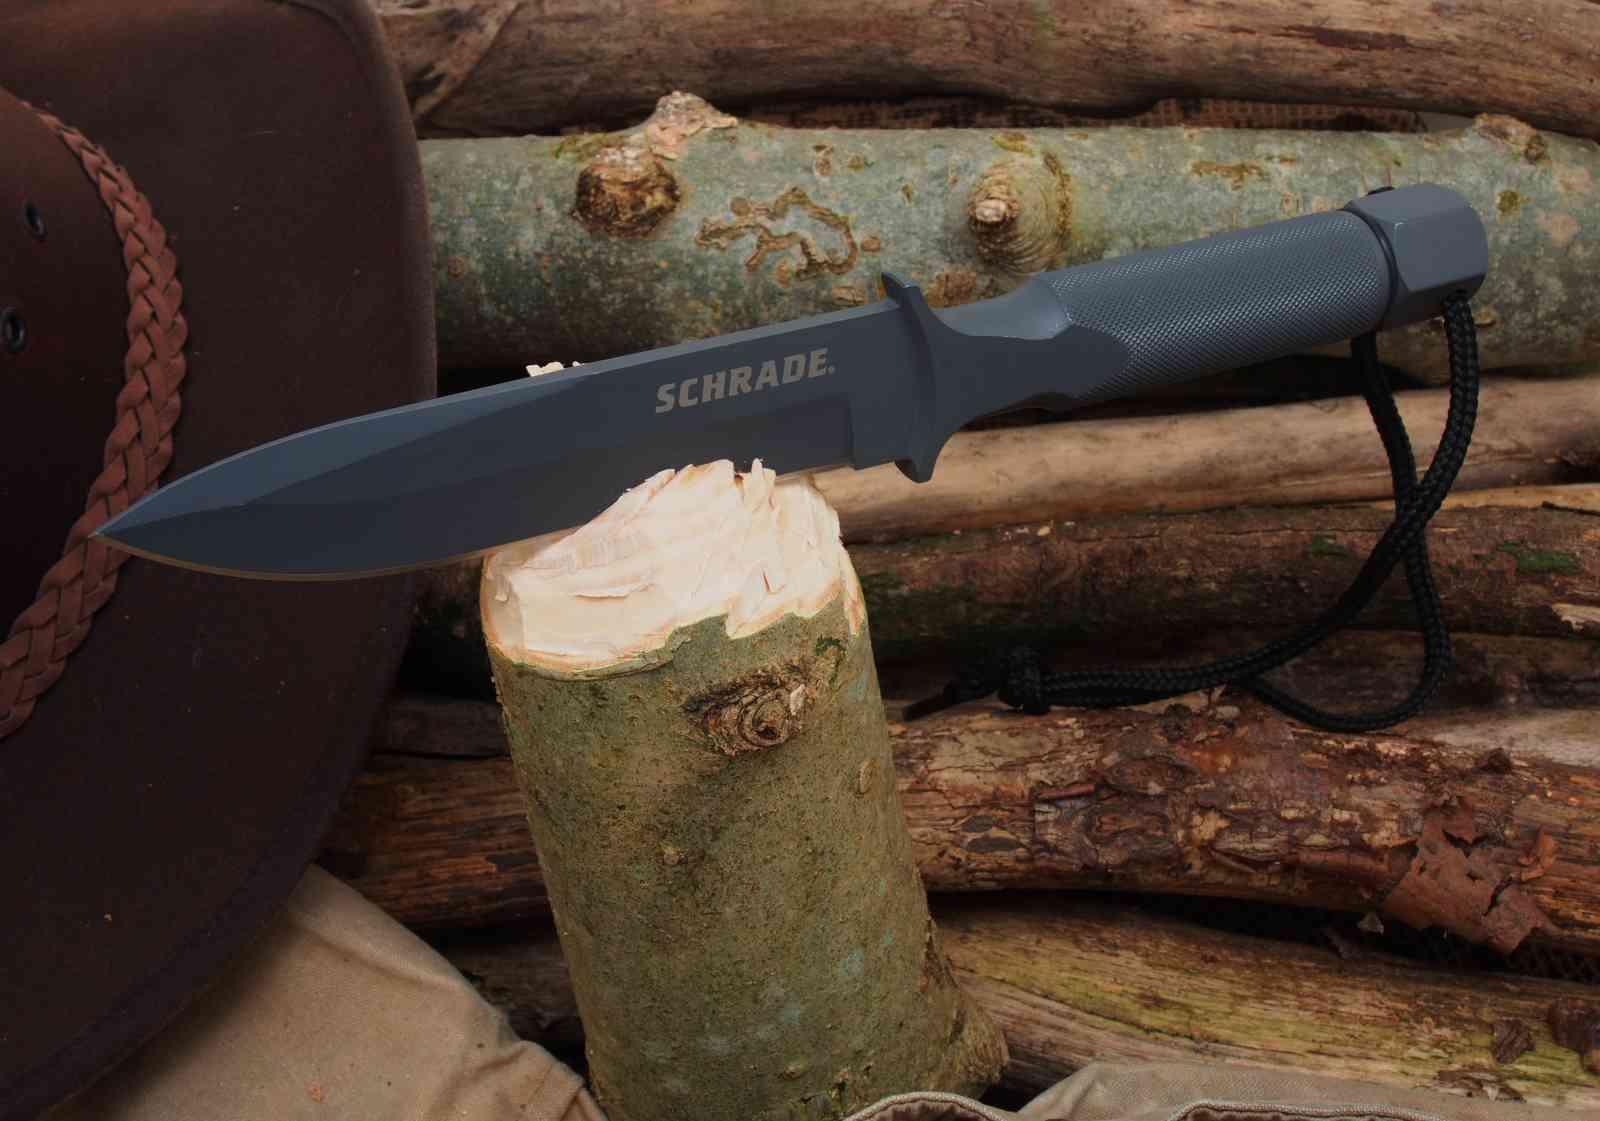 Schrade Extreme Survival Knife SCHF1SM - Batoning